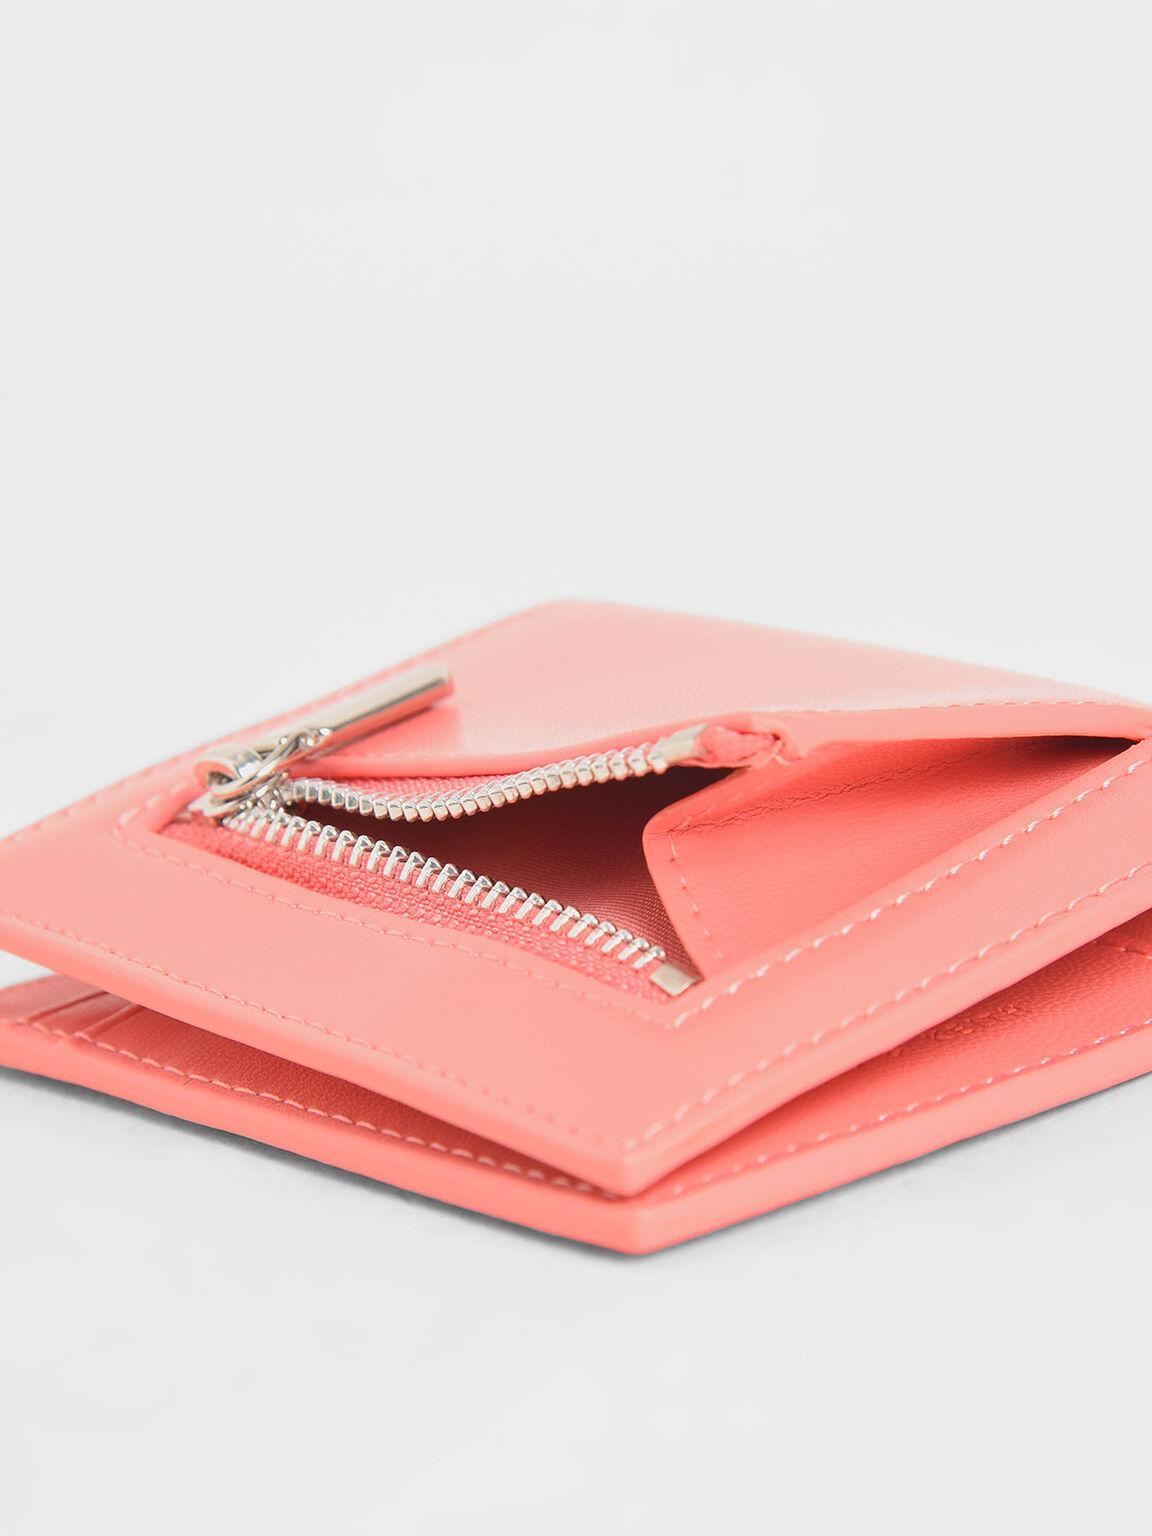 Square Small Wallet, Pink, hi-res